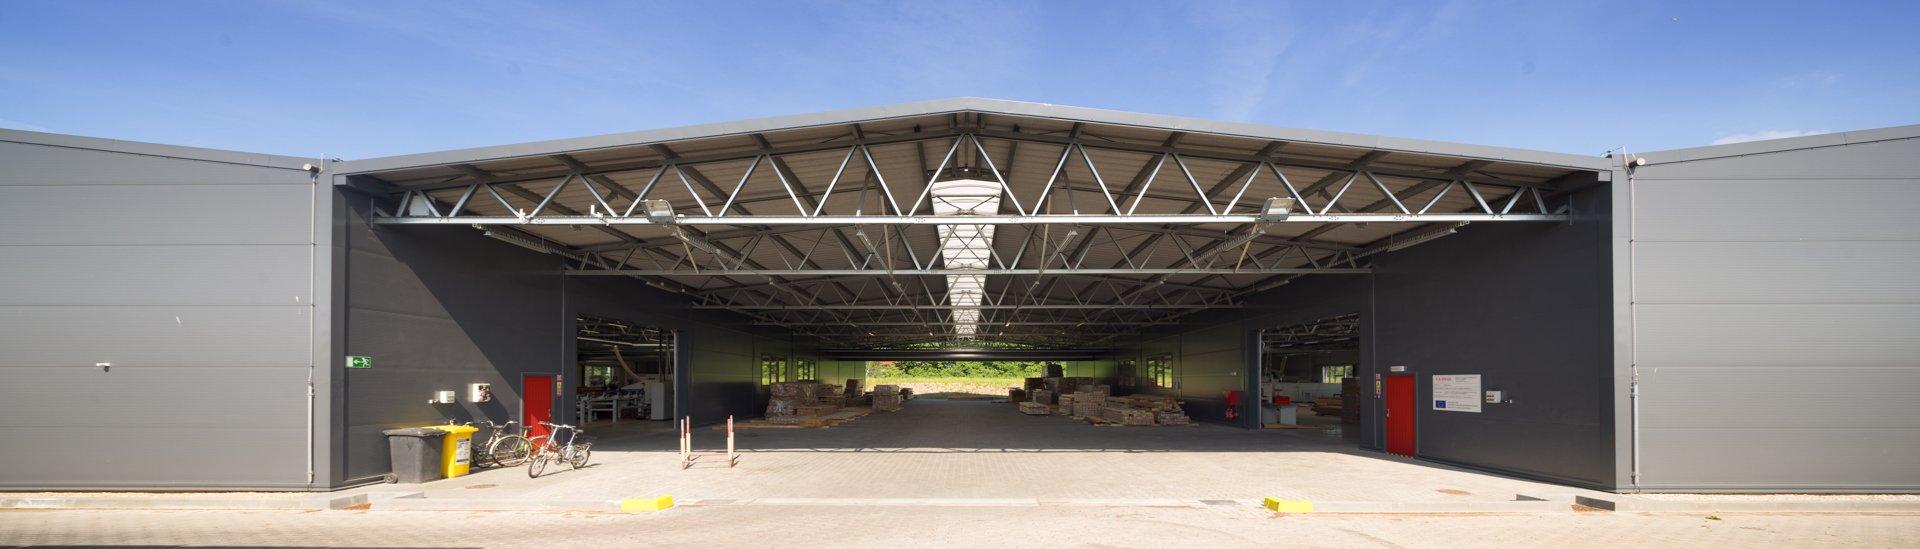 Montované ocelové haly LLENTAB